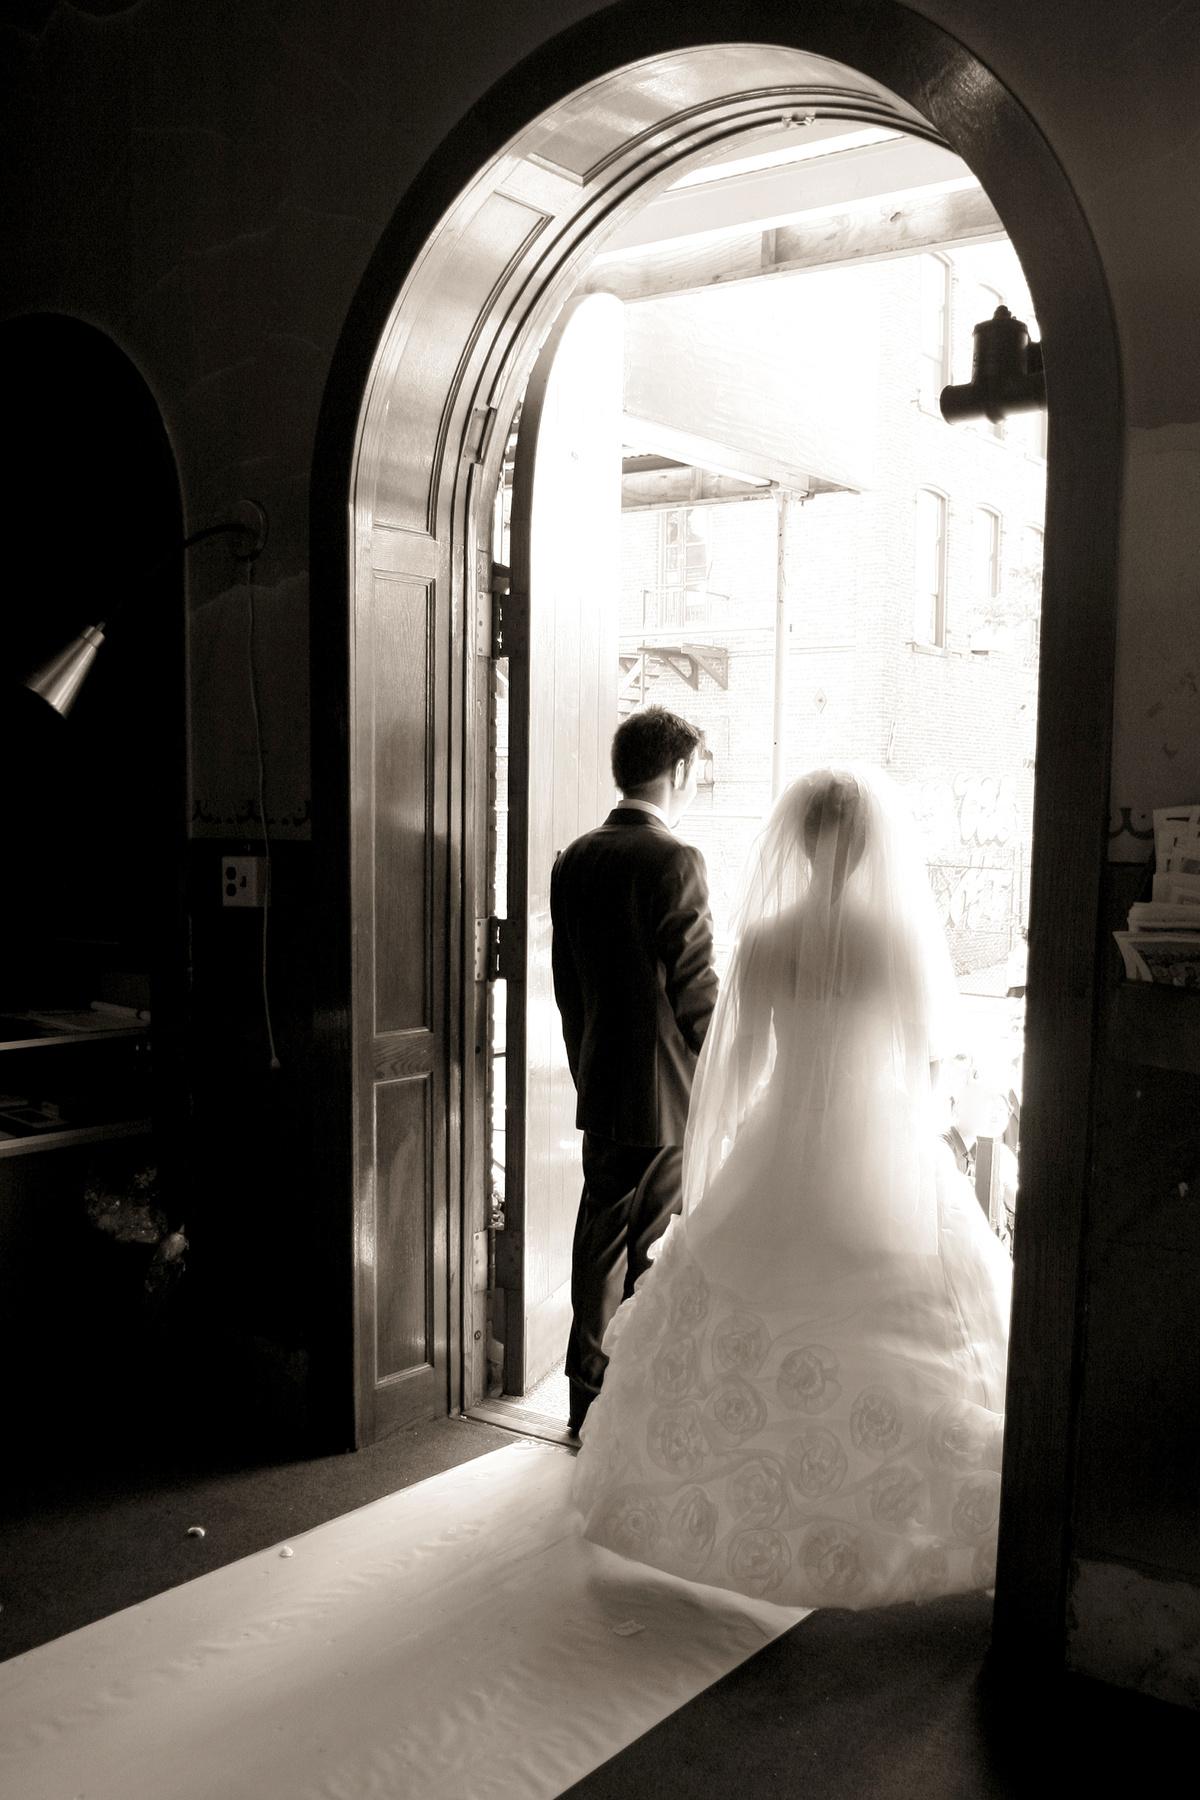 Having fun with wedding photography for Self wedding photography